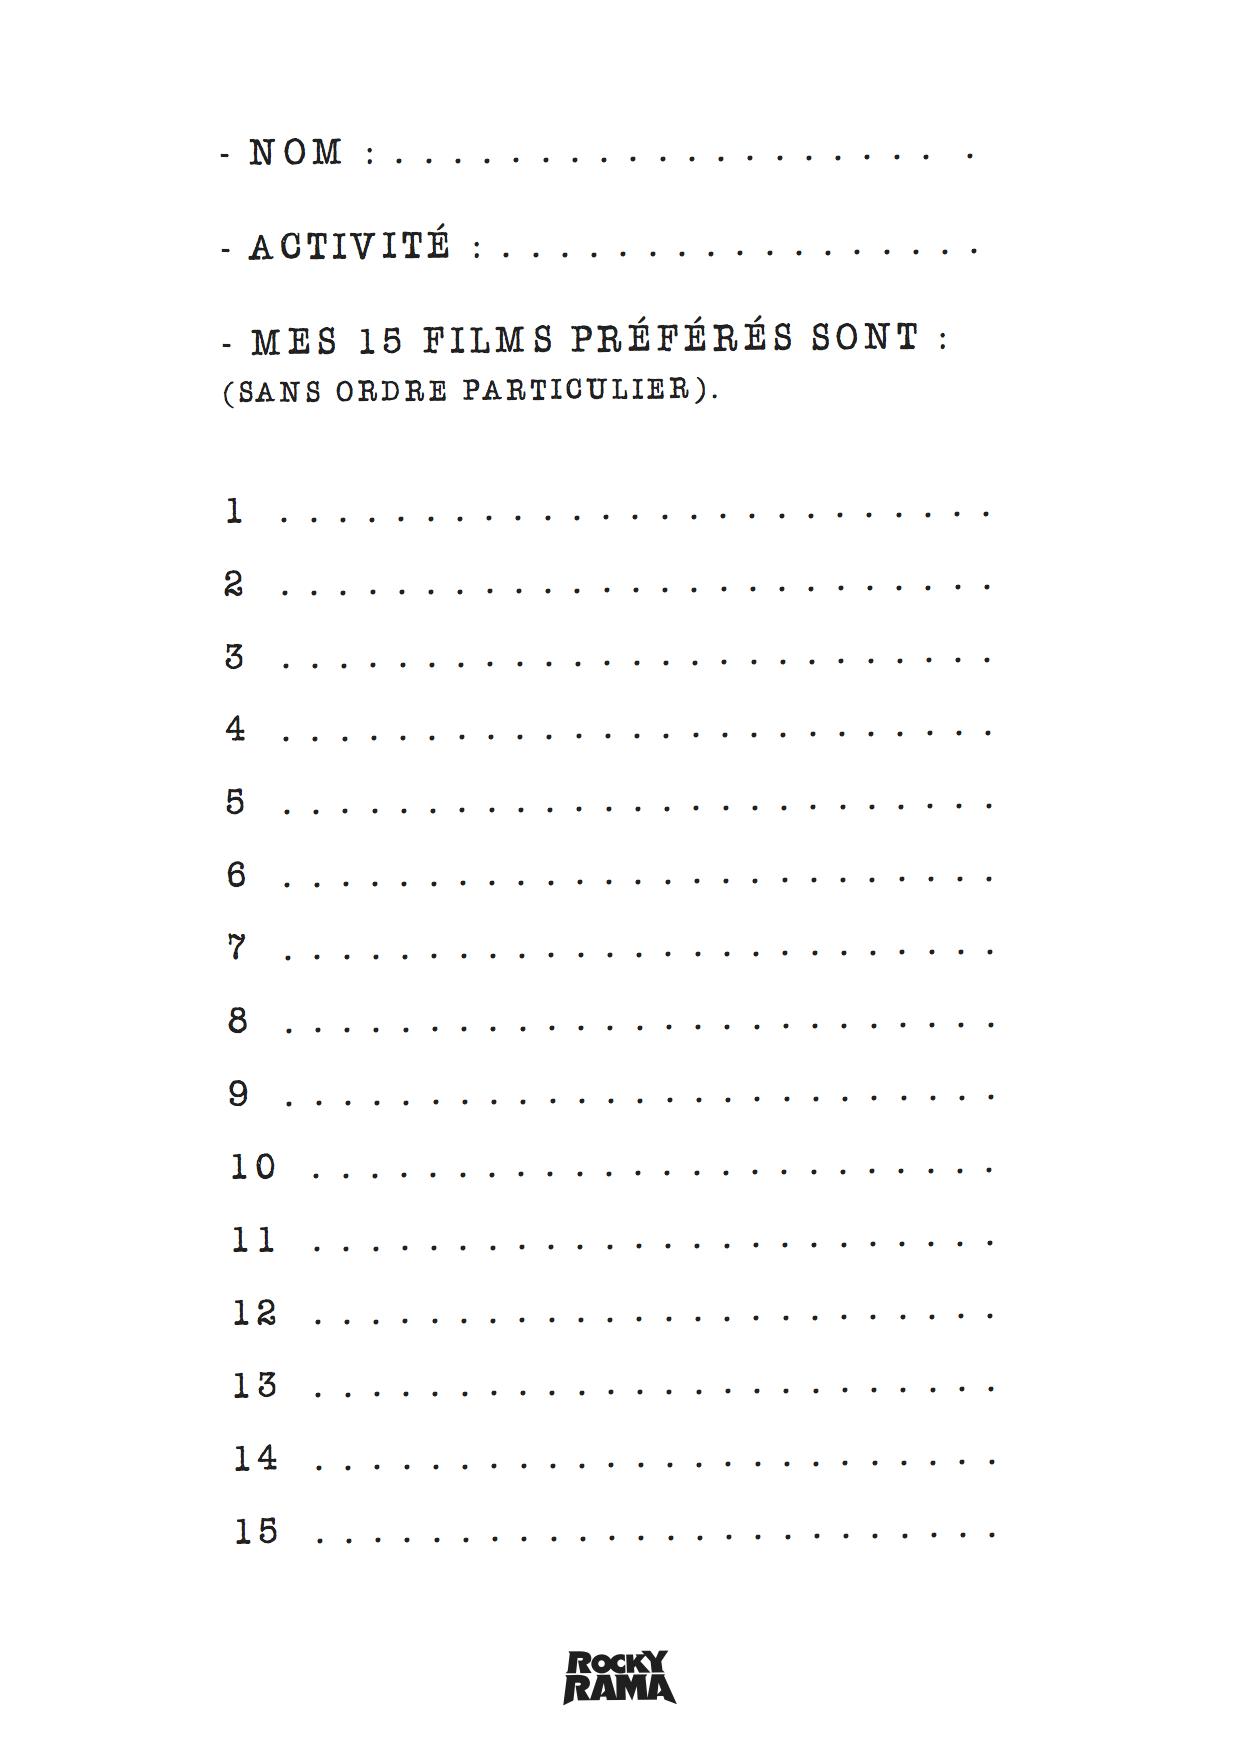 mes-15-films-preferes-sont